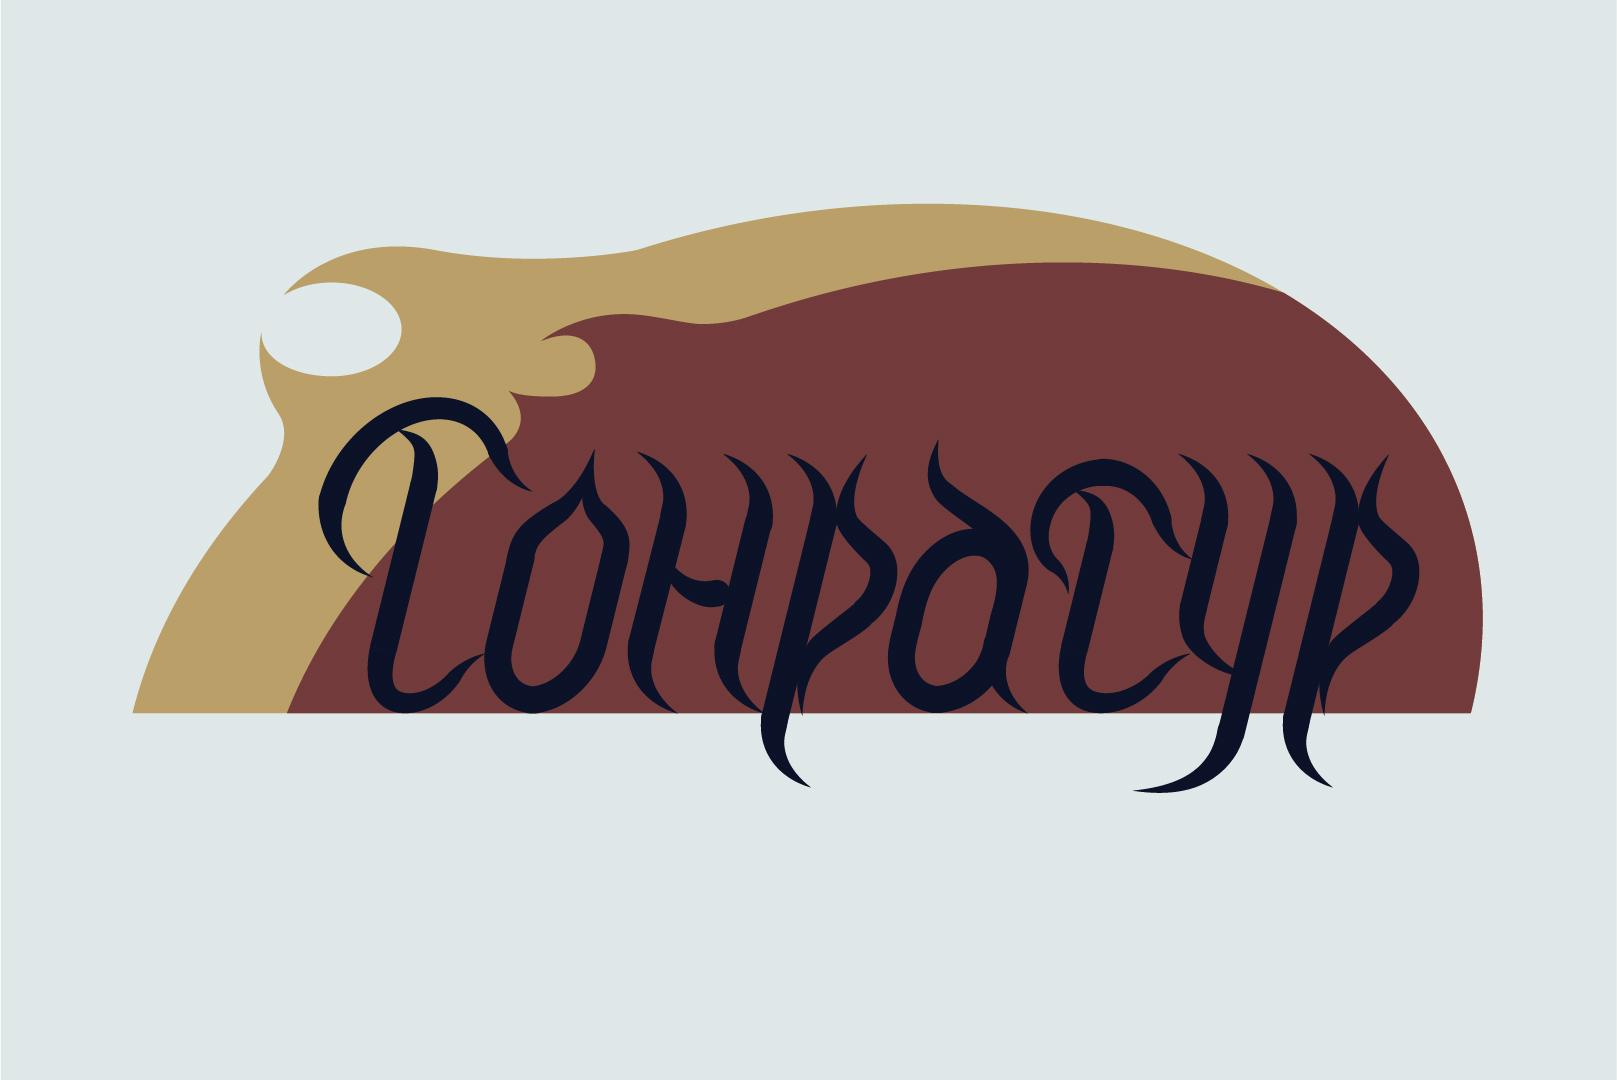 Логотип для Пекарни-Тандырной  фото f_4995d91a559c39d0.jpg